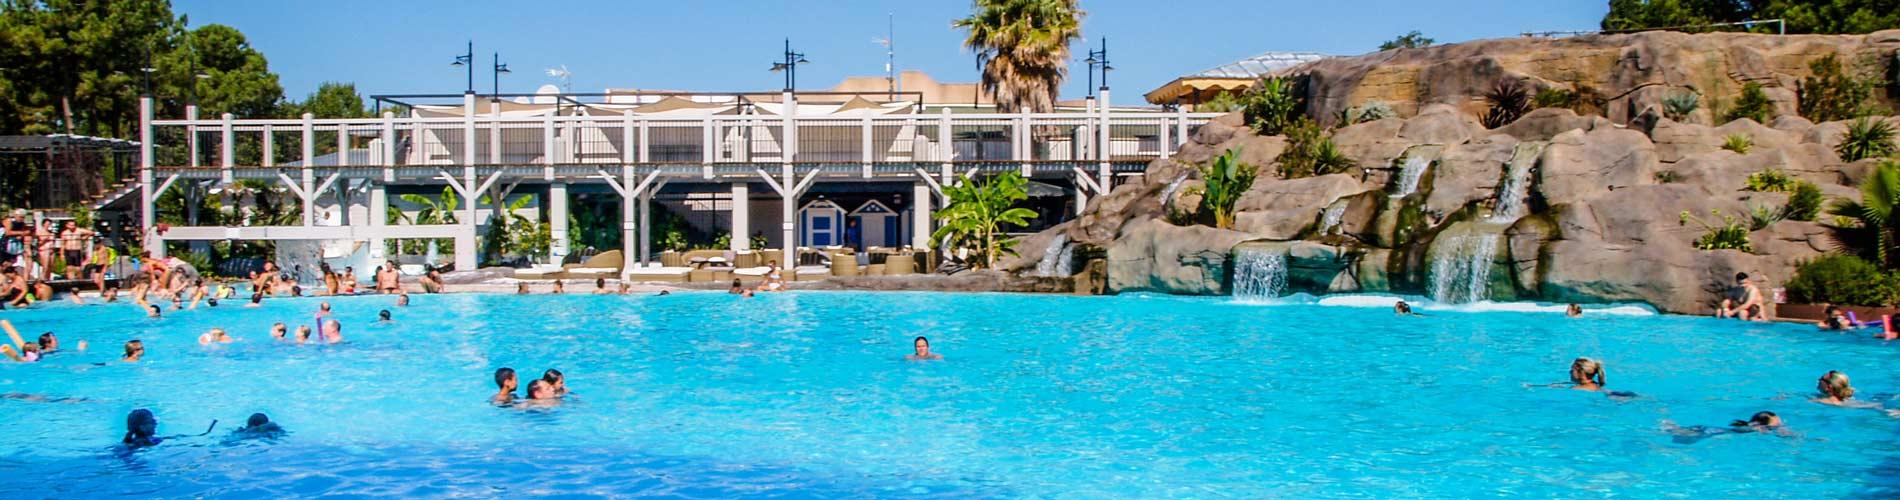 Camping argeles sur mer avec parc aquatique for Camping martigues avec piscine bord mer